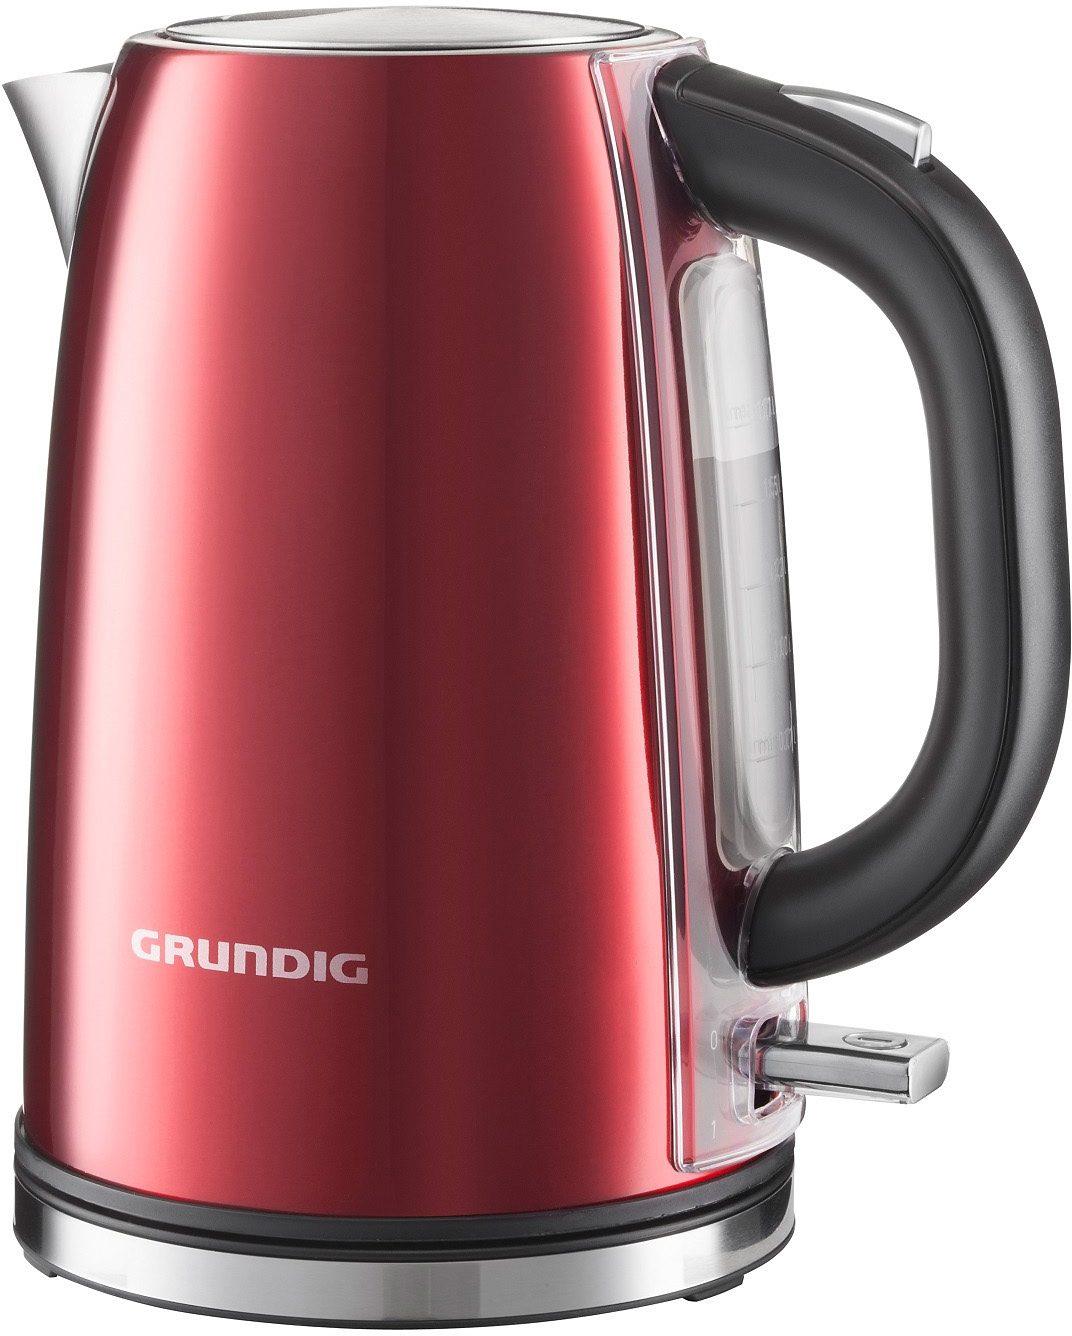 Grundig Wasserkocher WK 6330 »RED SENSE«, 1,7 Liter, 3000 Watt, Metallic-Rot